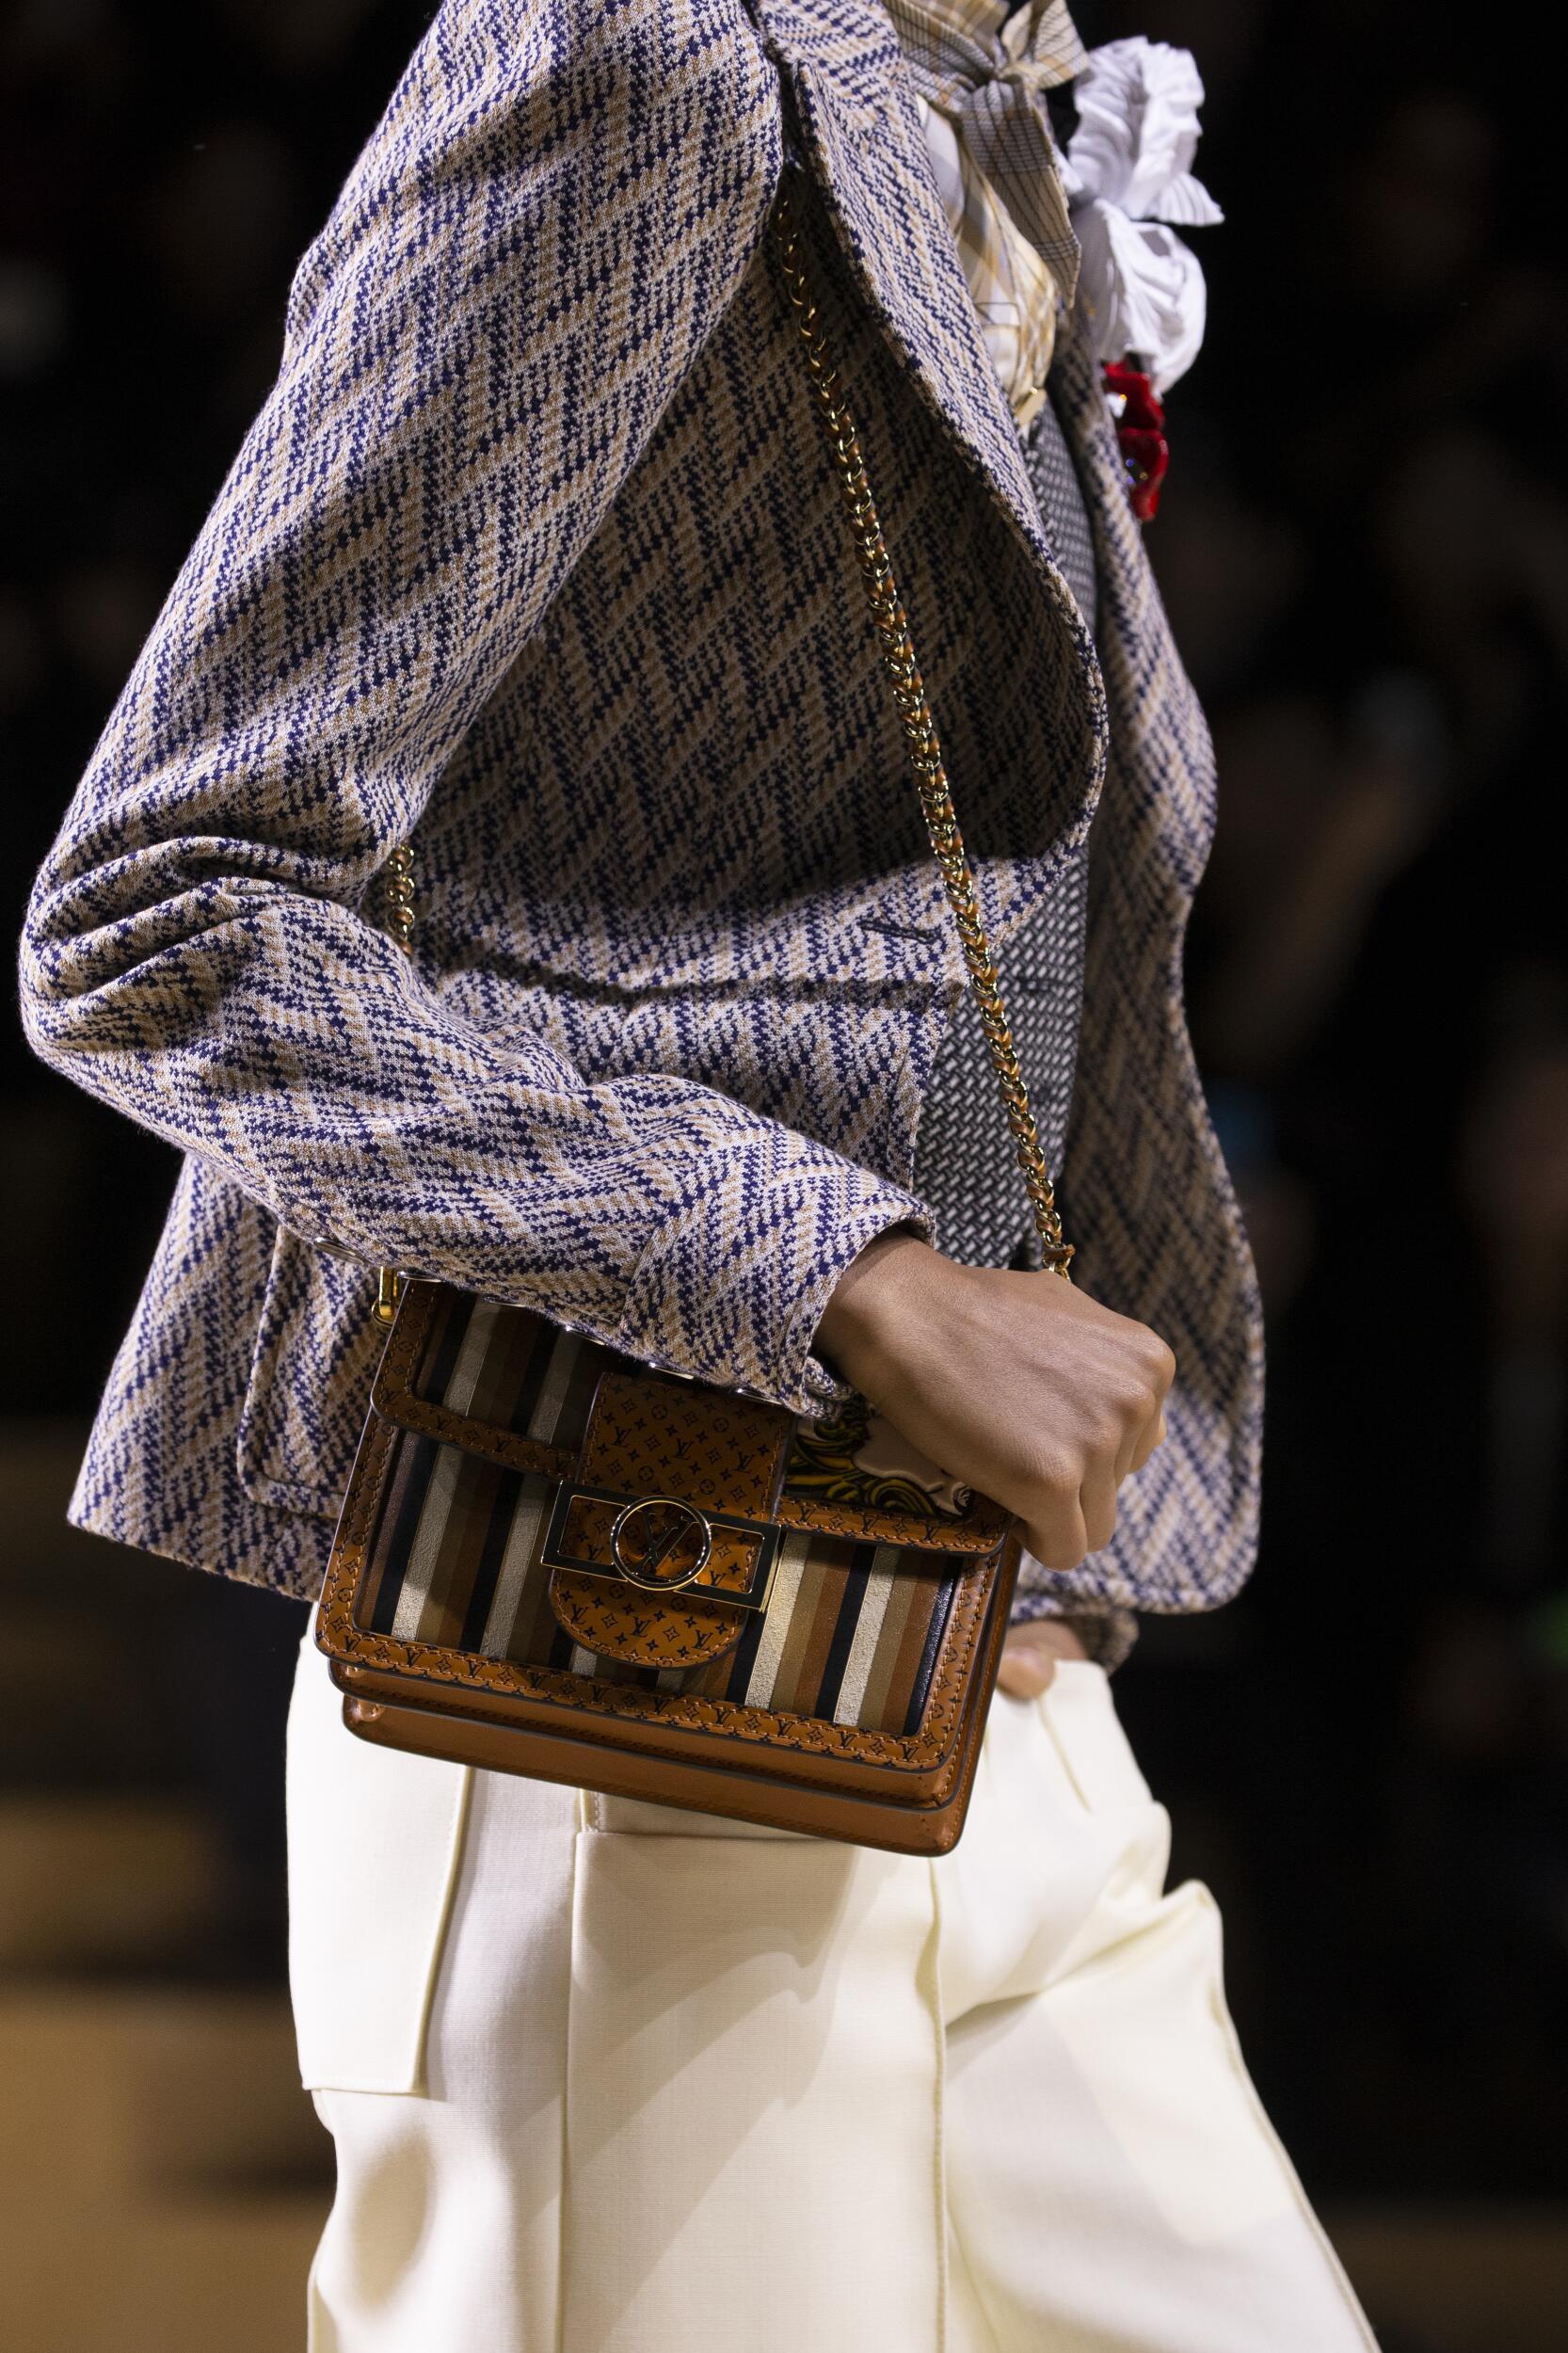 SS 2020 Louis Vuitton Bag